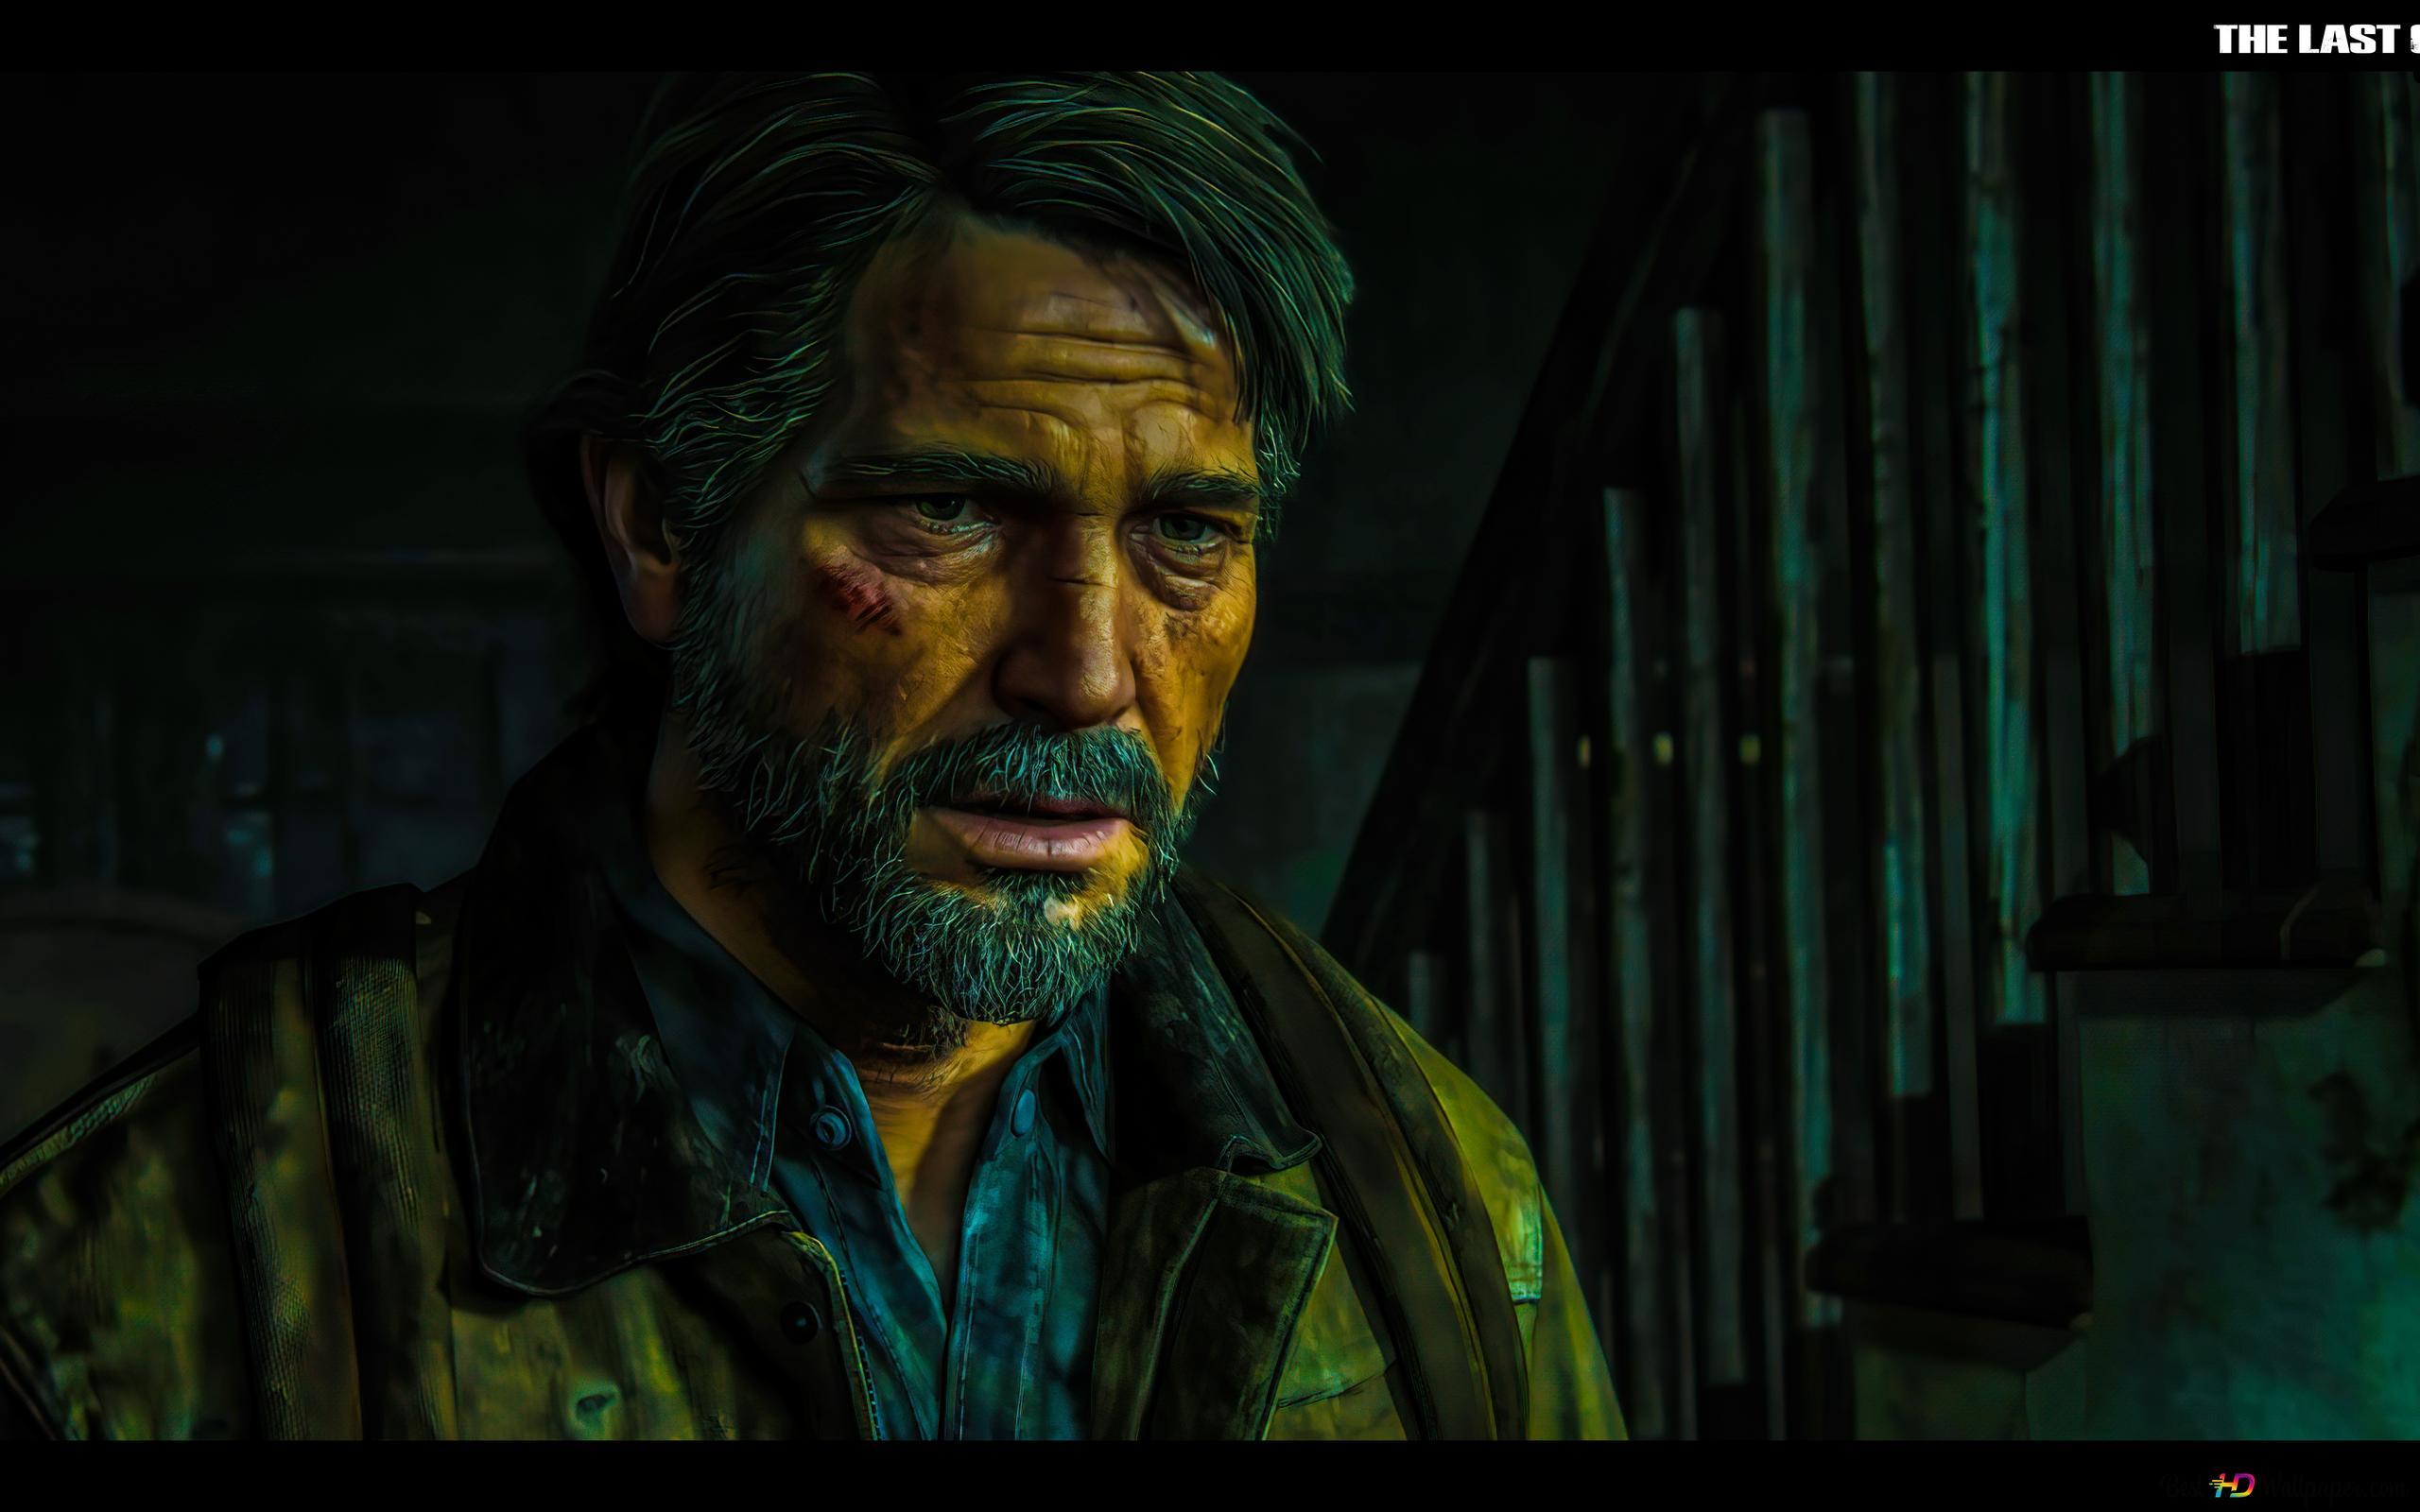 The Last Of Us 2 05 8k 4k Wallpaper Joel Hd Wallpaper Download